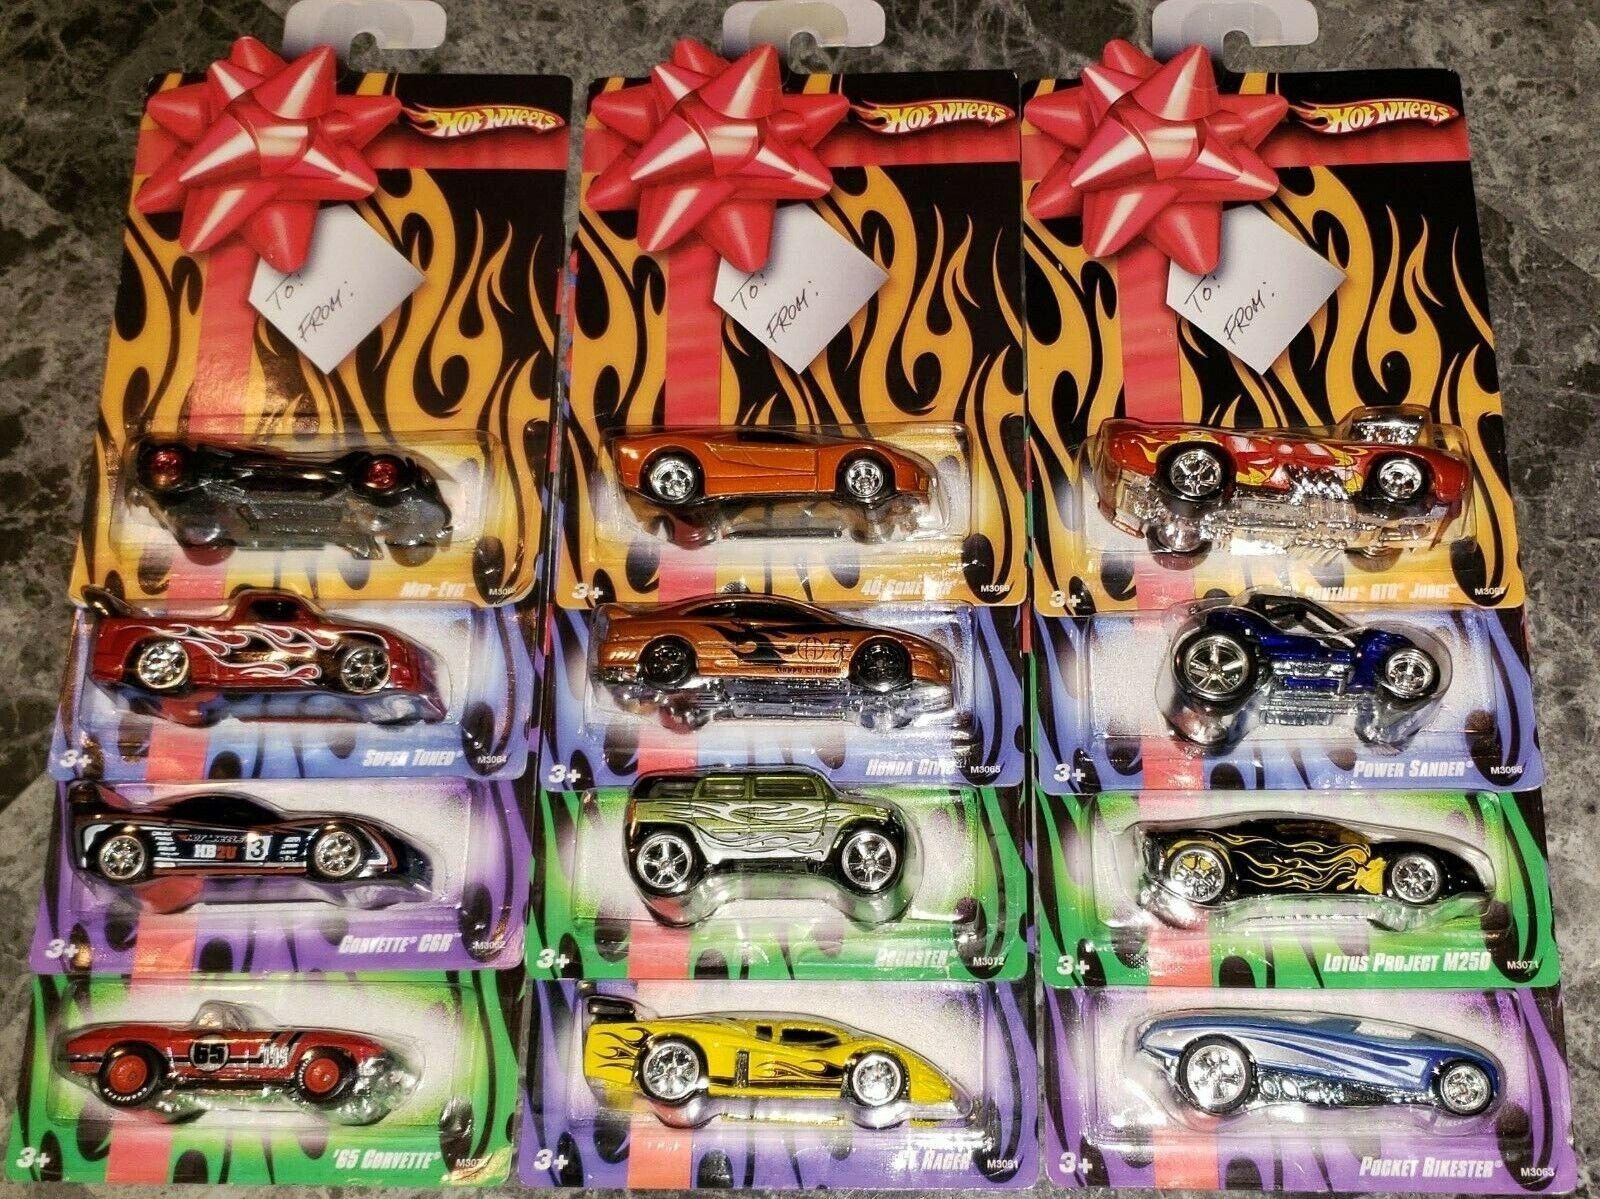 HOT WHEELS 2007 BIRTHDAY SET OF 12 REAL RIDERS CARS MOC